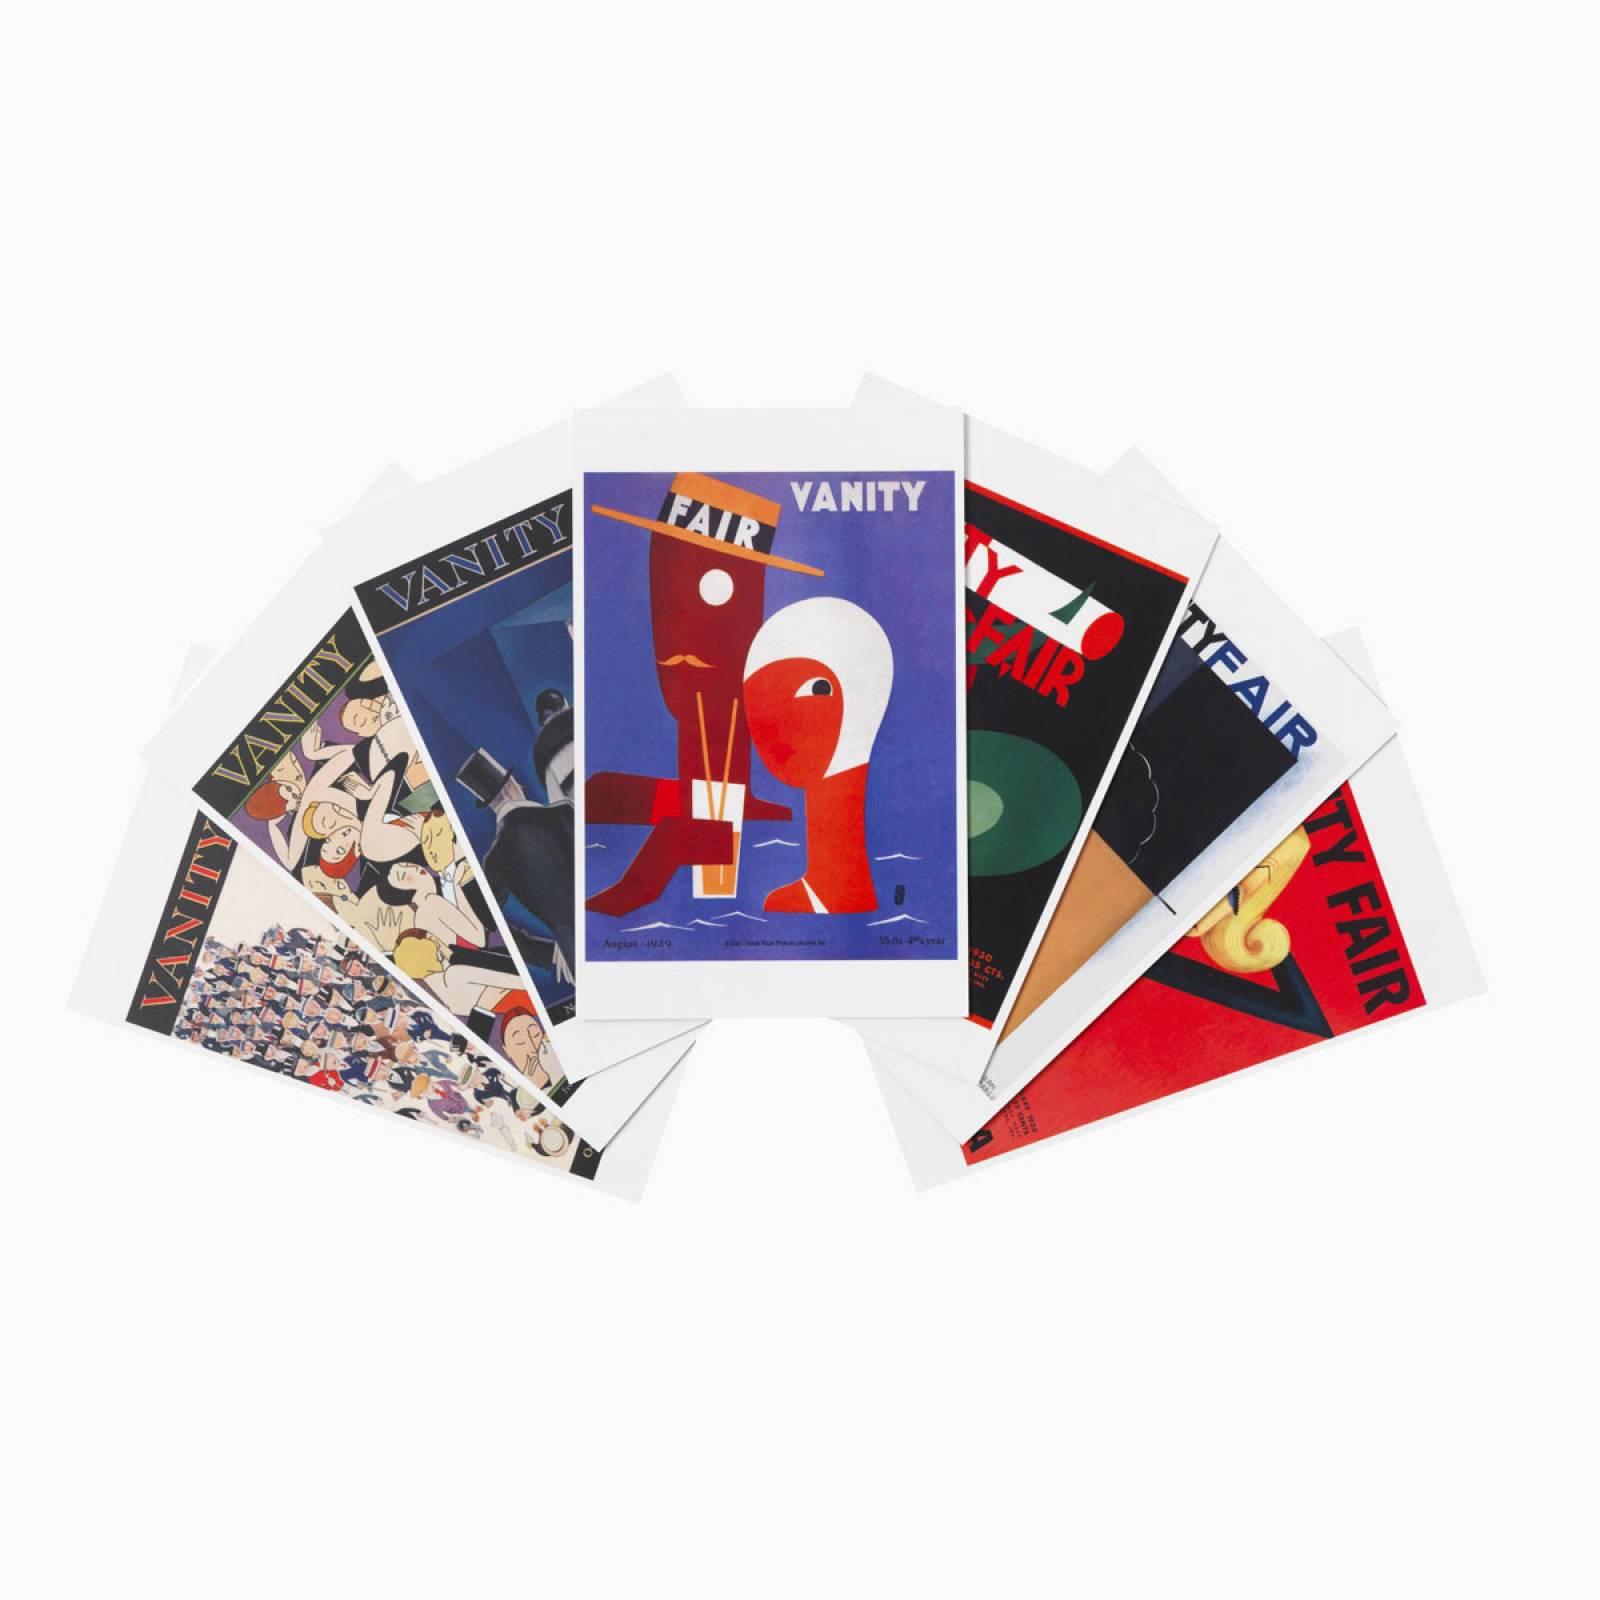 Vanity Fair Cover 100 Card Postcard Box thumbnails